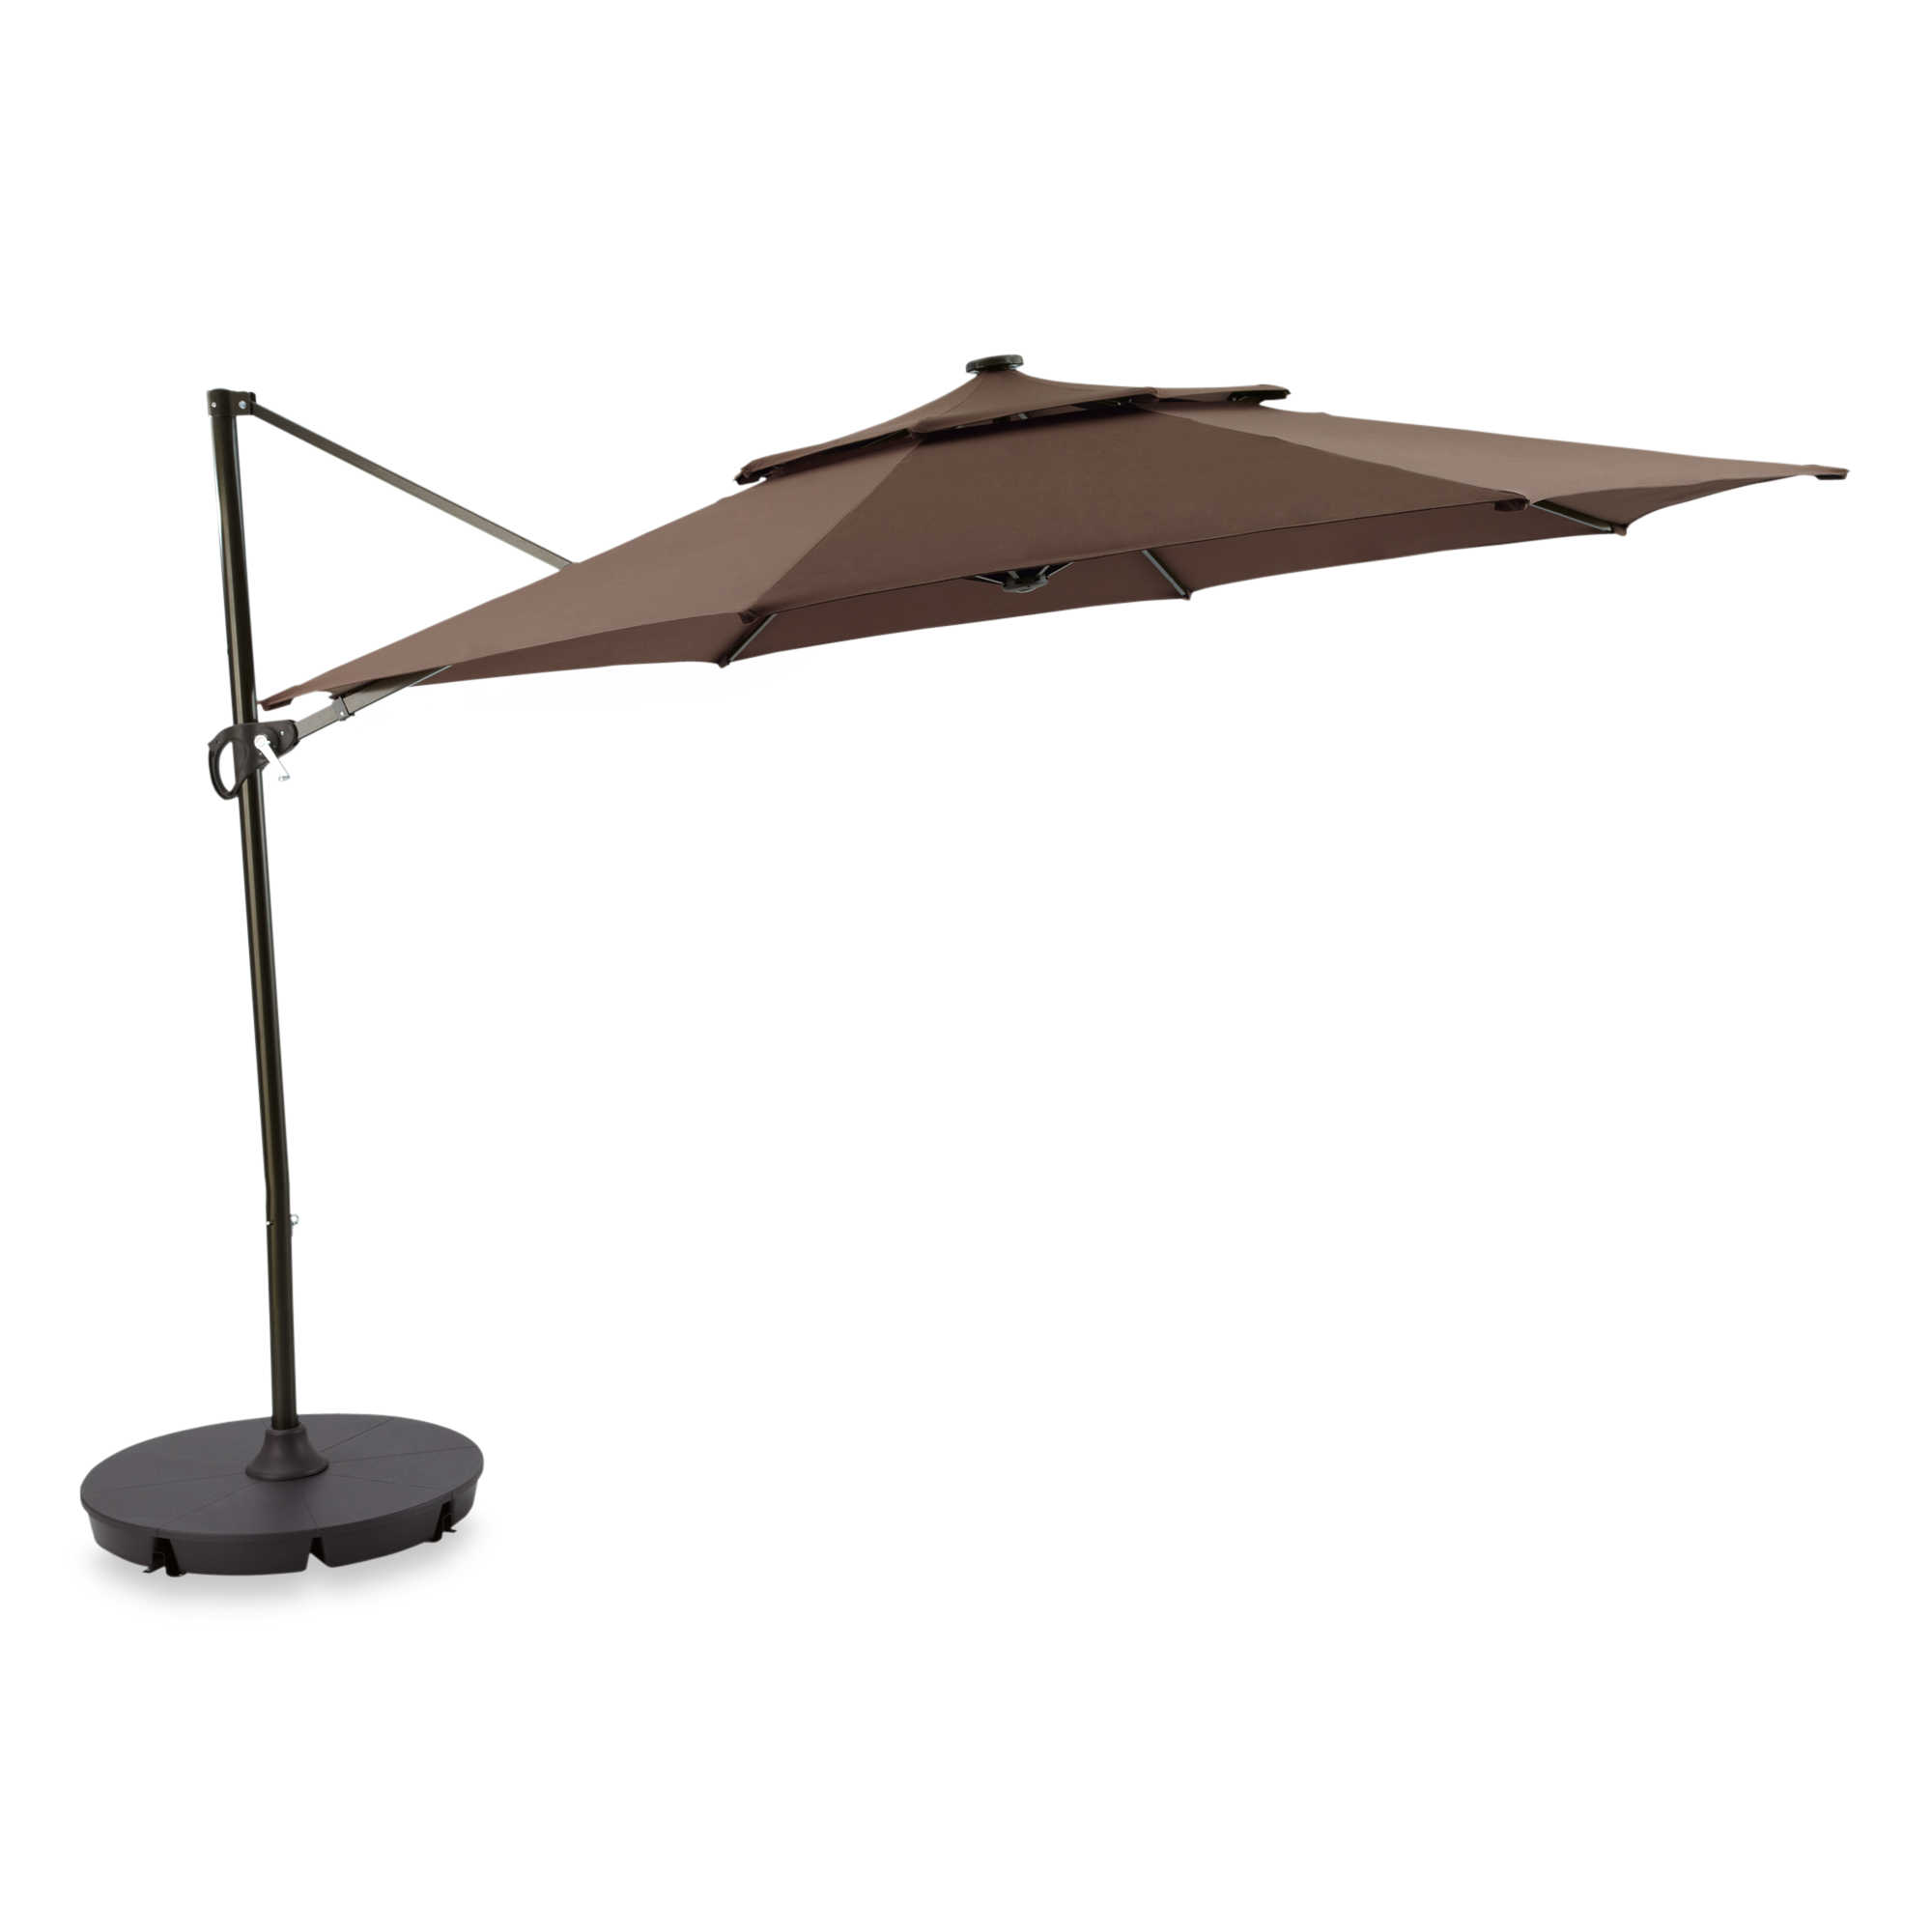 11 foot round umbrella cantilever offset solar led lighted patio shade awning ebay. Black Bedroom Furniture Sets. Home Design Ideas